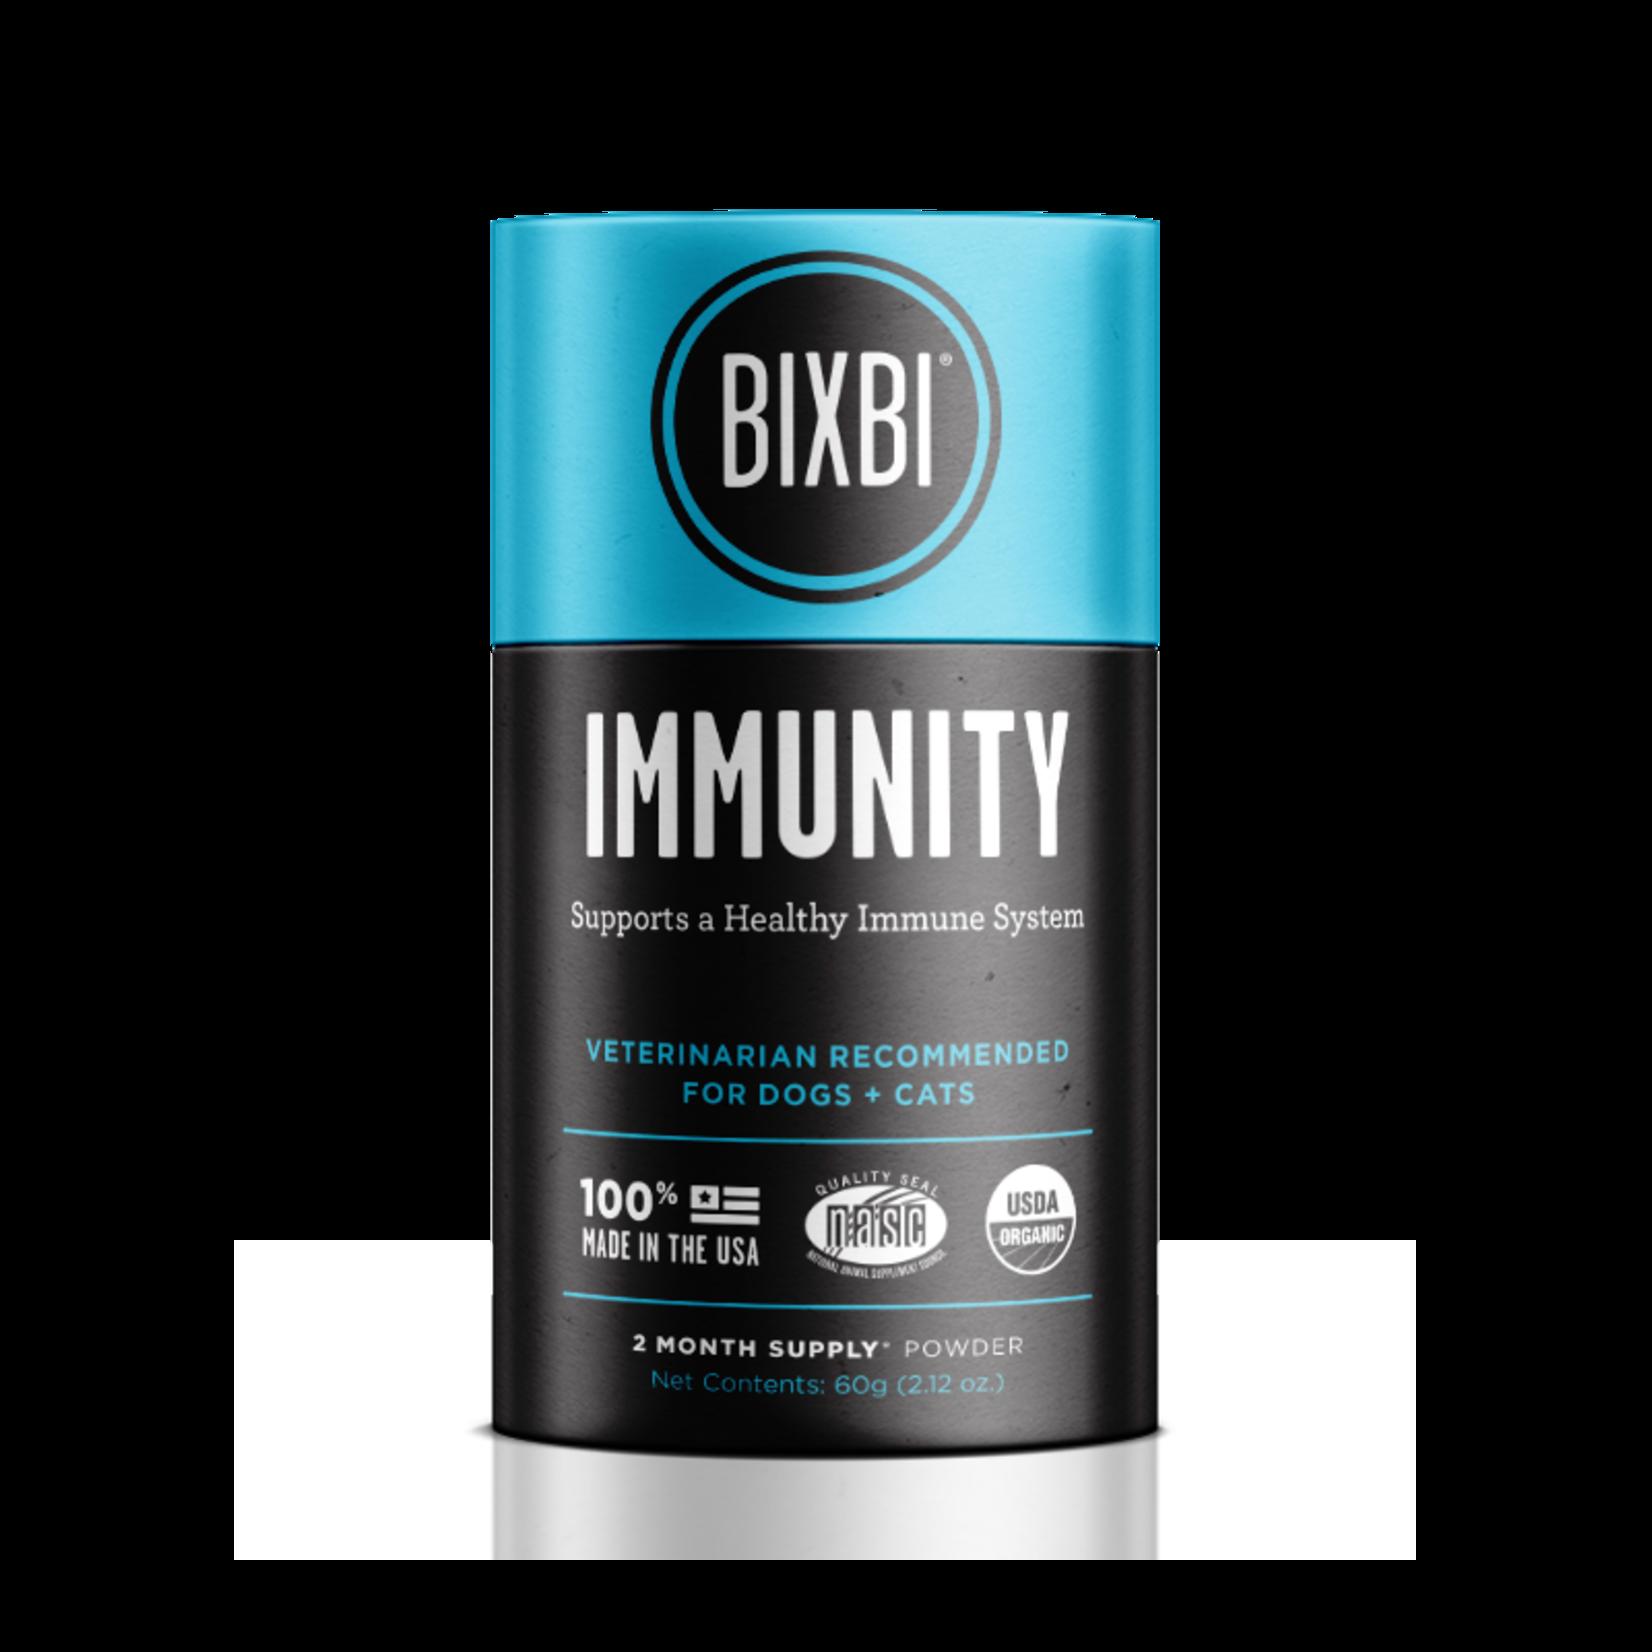 Bixbi Bixbi Immunity Supplement Dogs & Cats 2 OZ